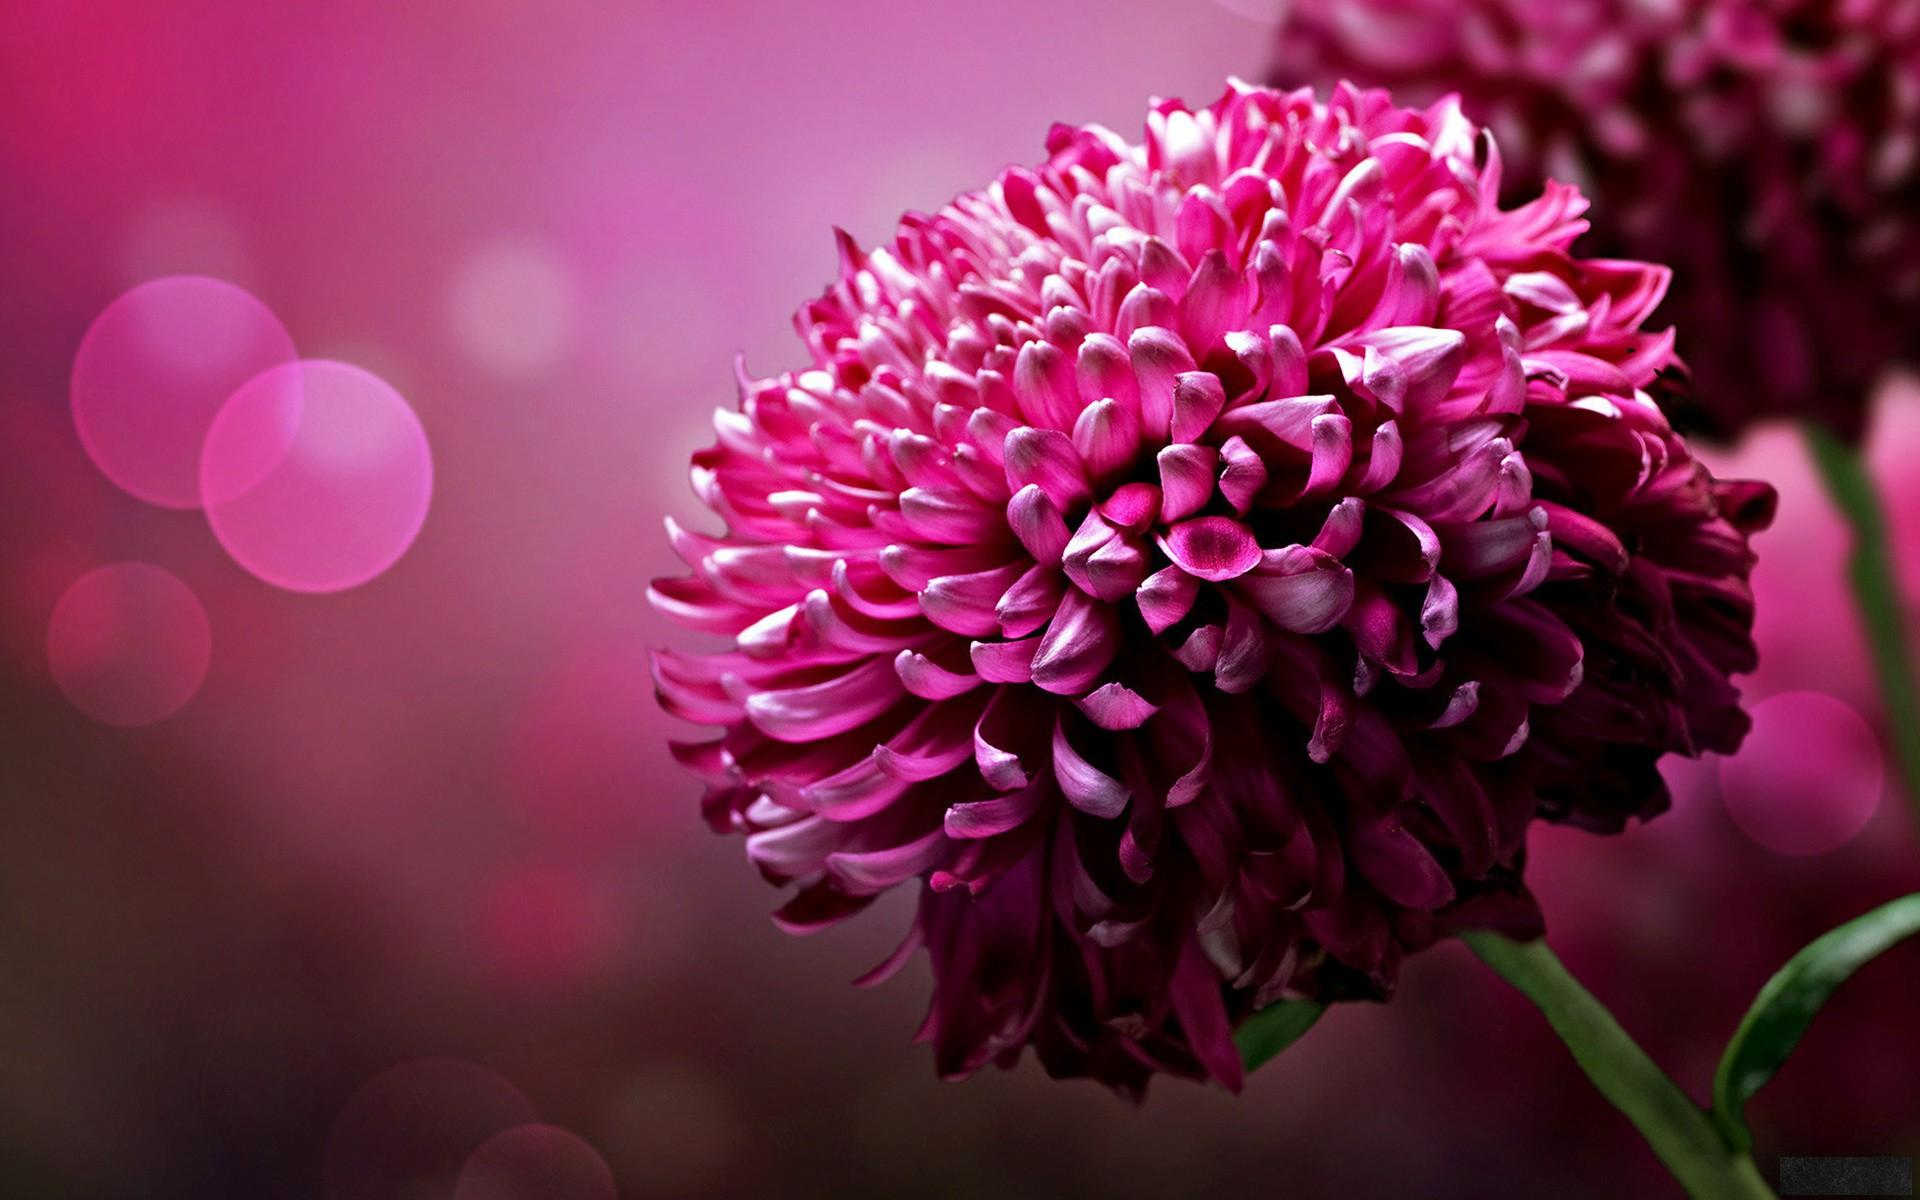 pretty flower pictures wallpaper  x, Beautiful flower